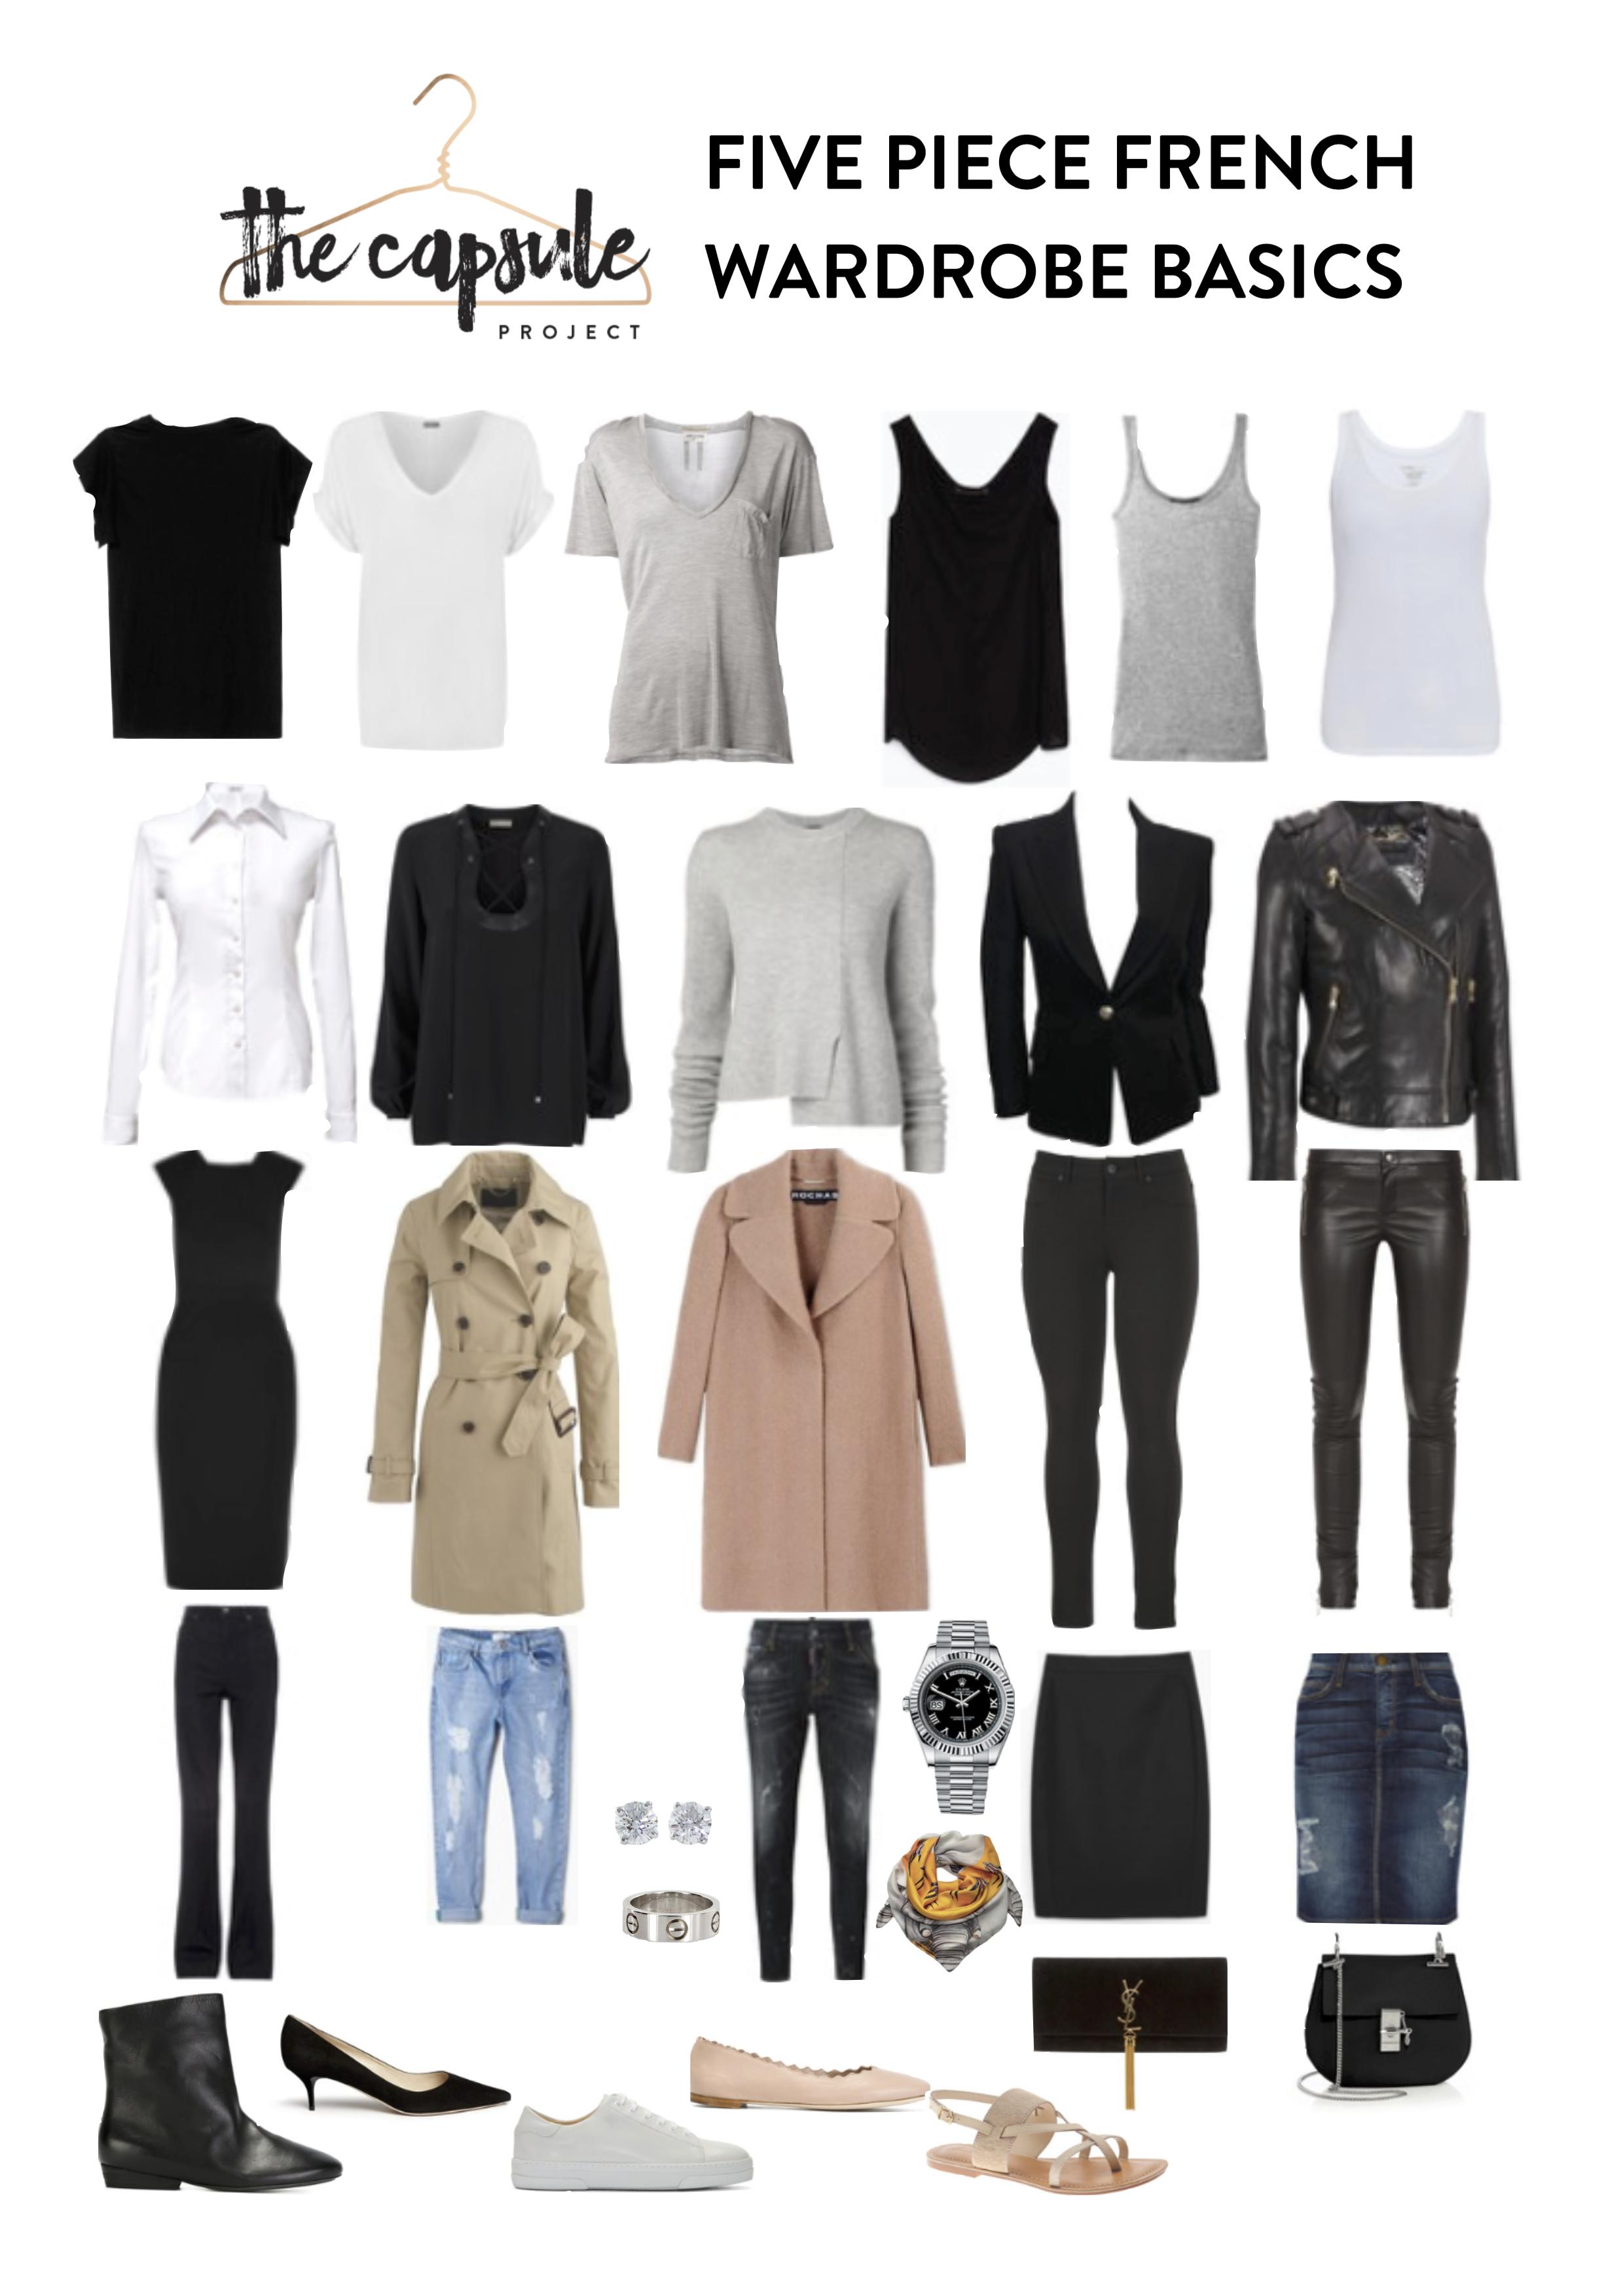 The Five Piece French Wardrobe - Fall 2015 Edition #wardrobebasicsfall2015